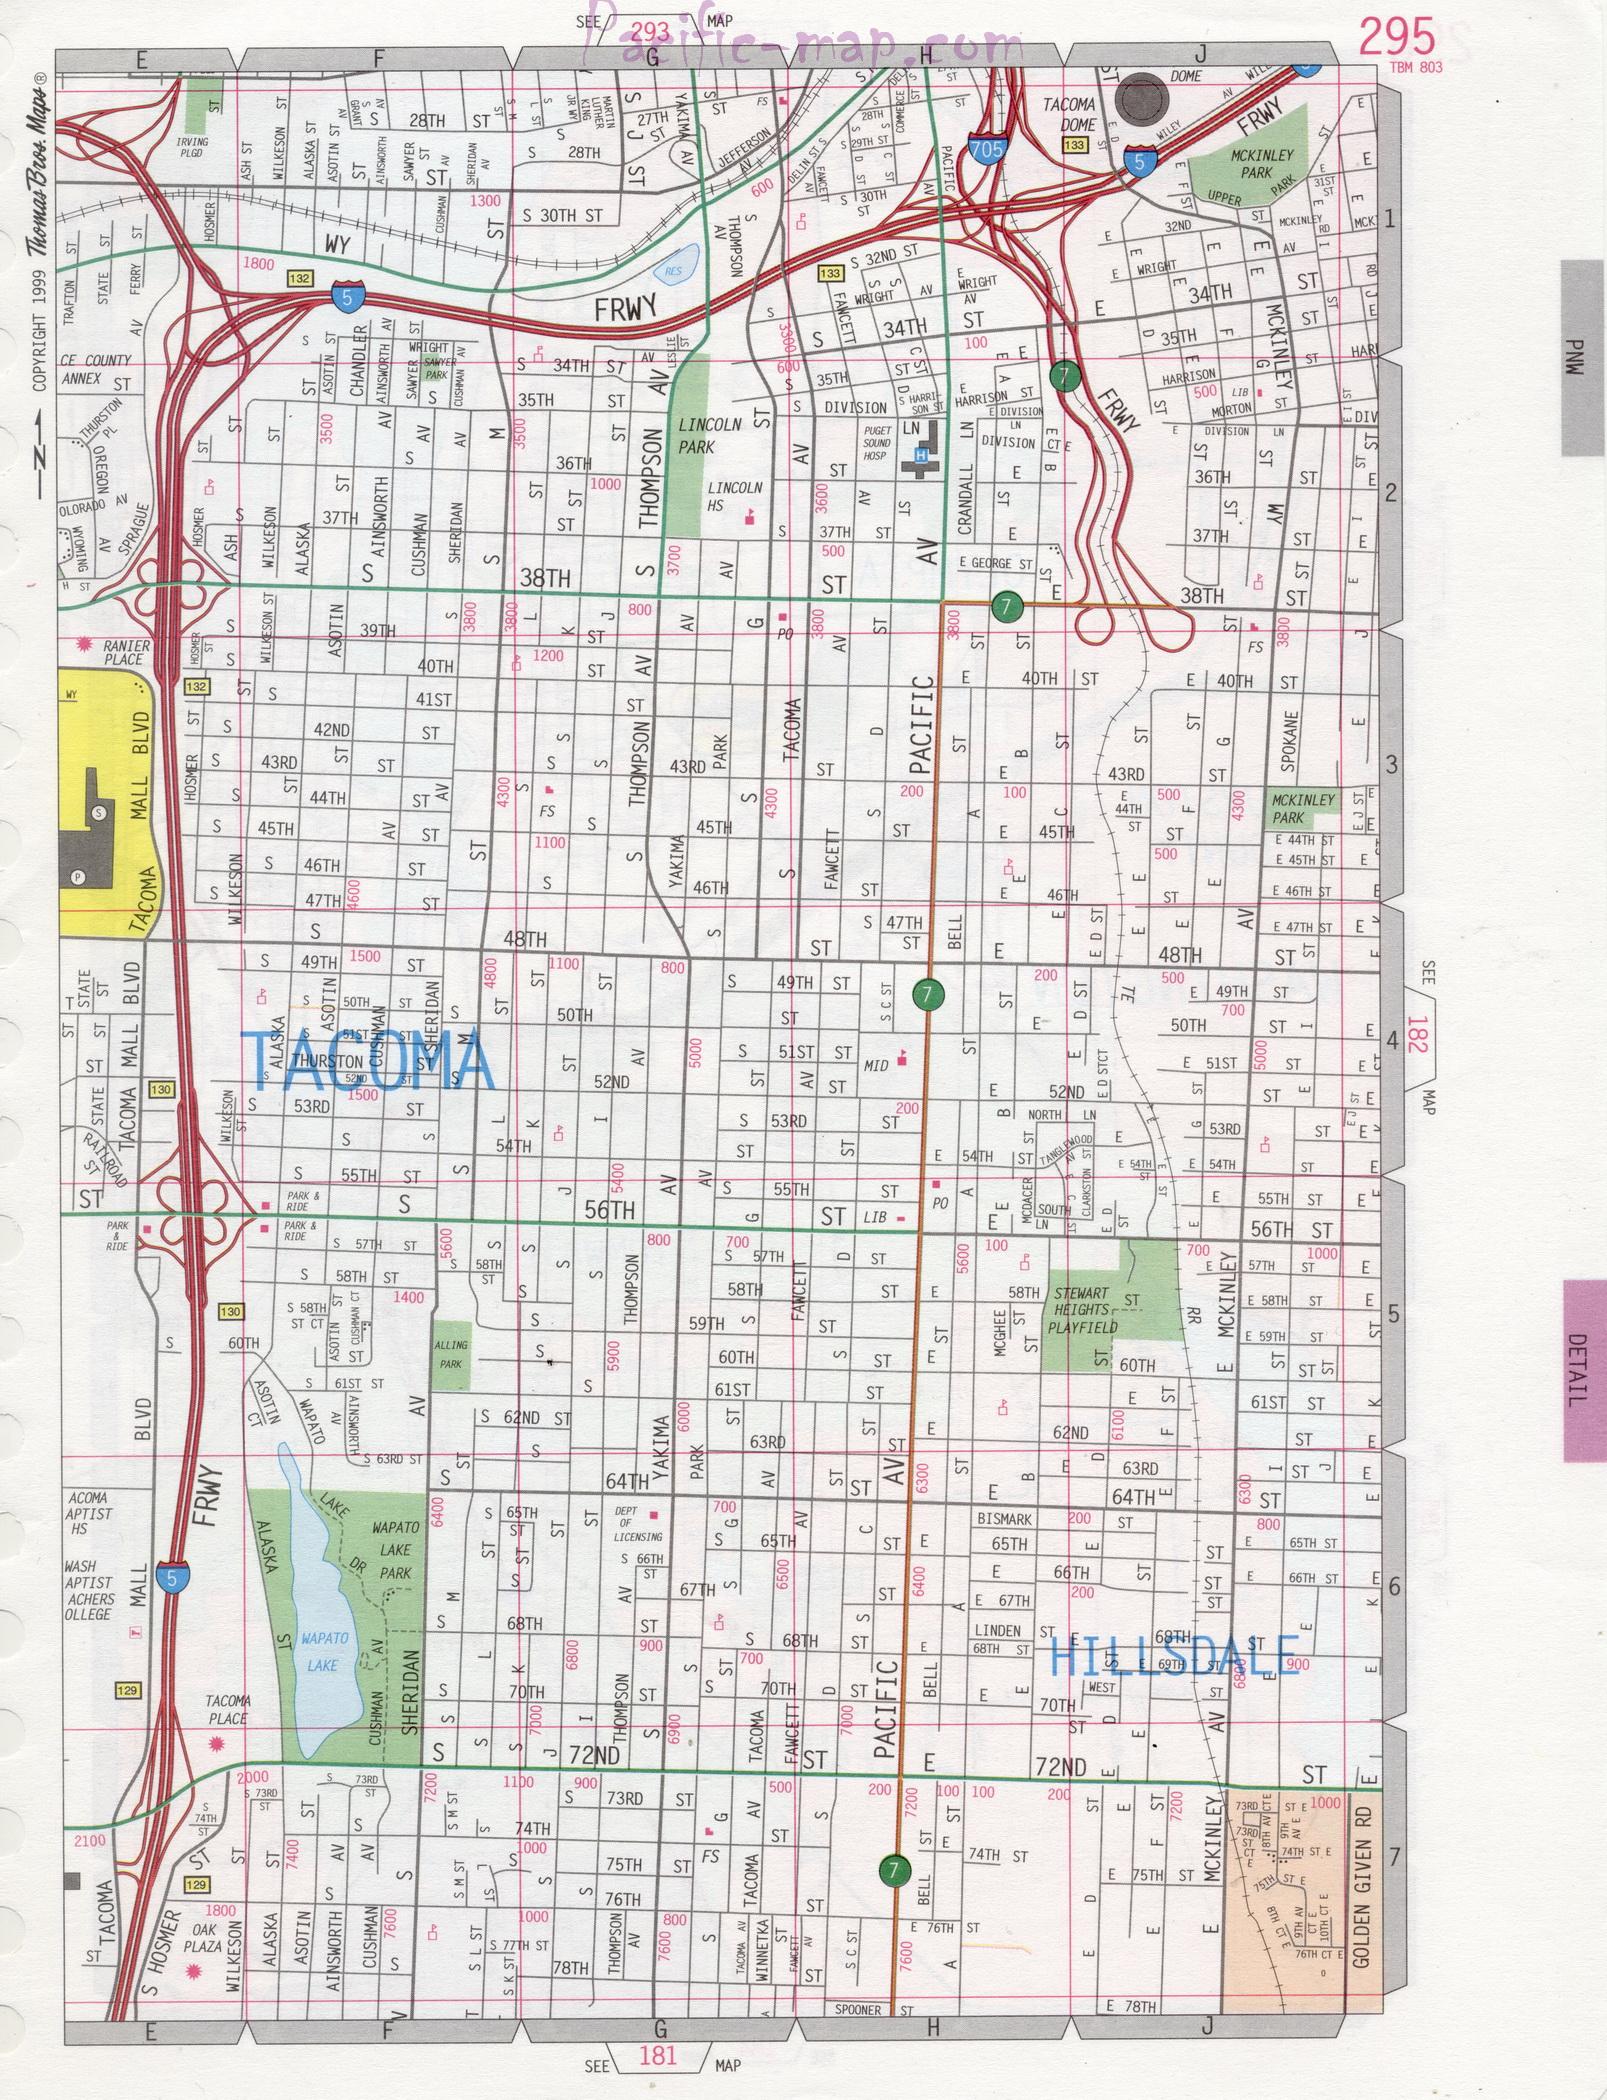 Map Of Tacoma Washington Tacoma WA road map Map Of Tacoma Washington